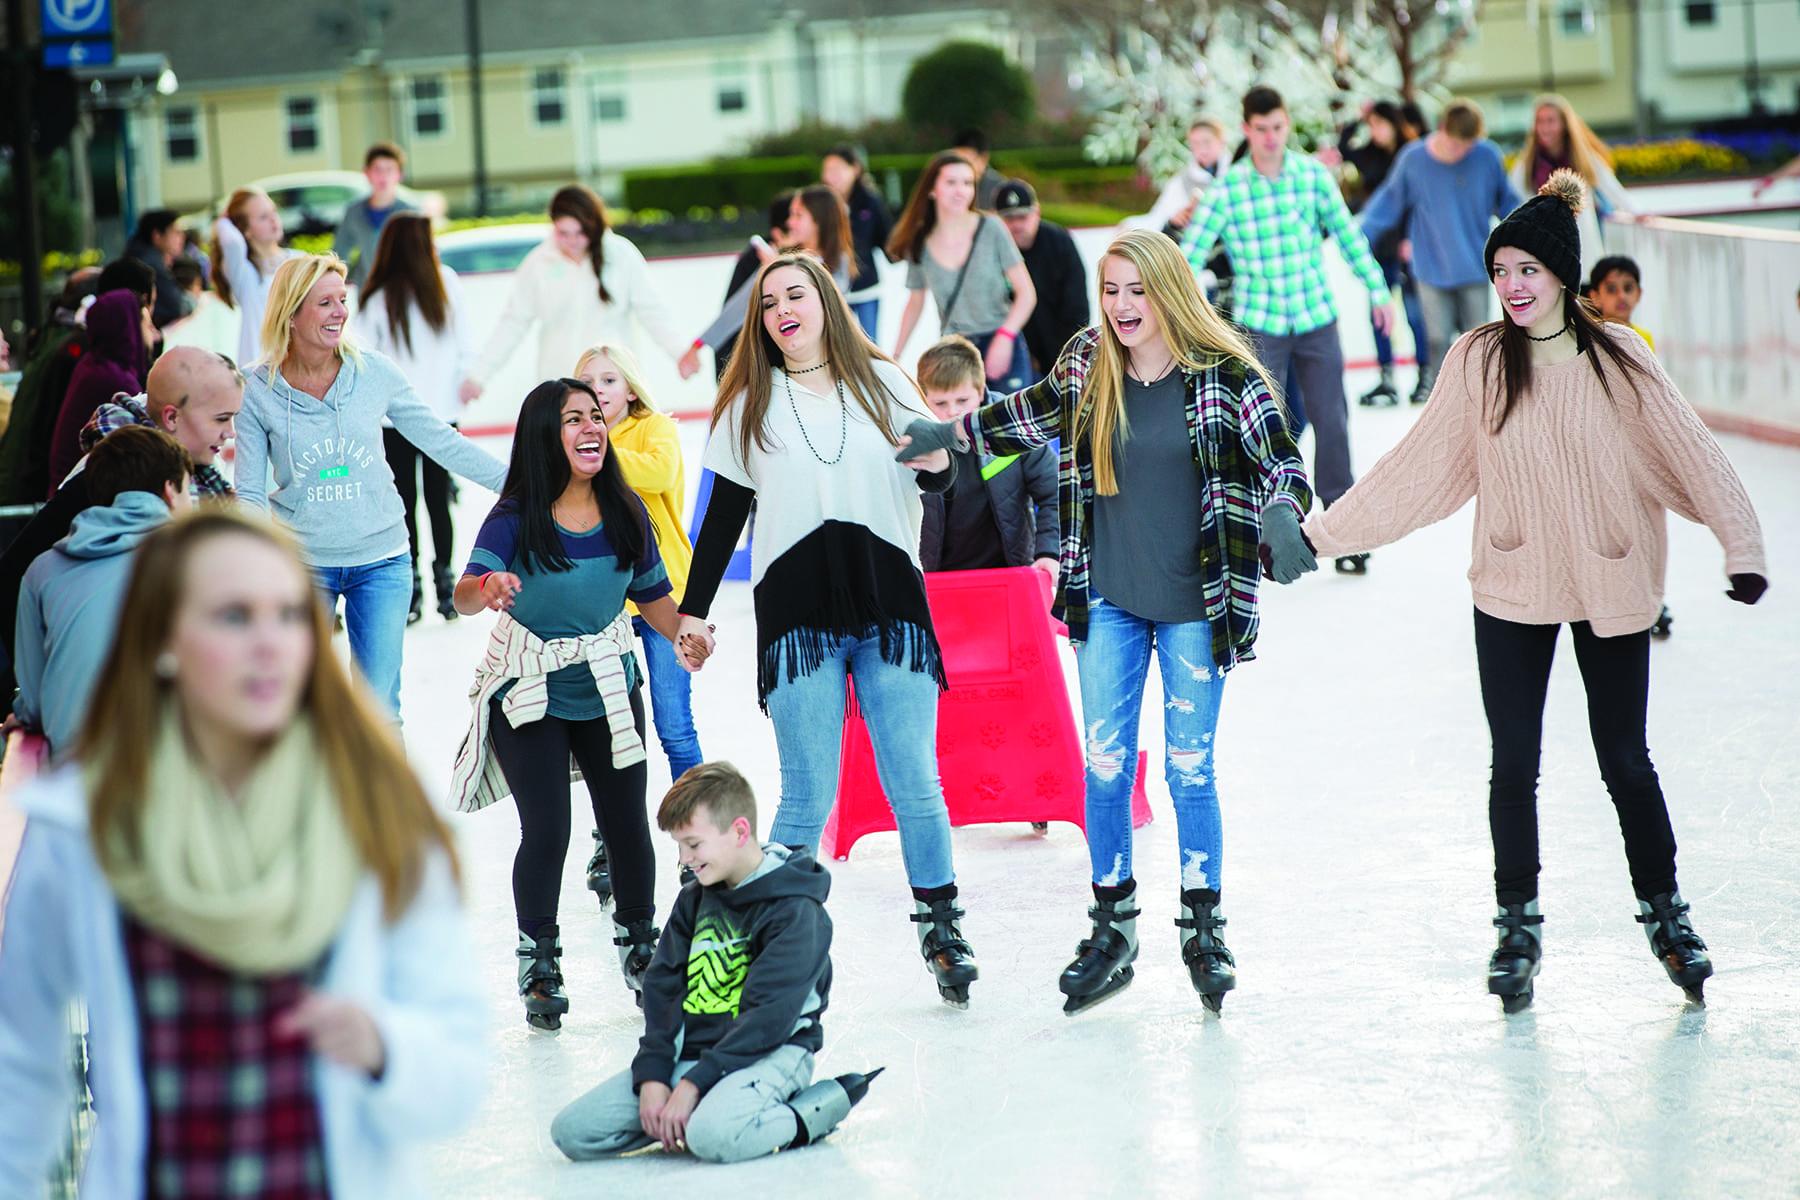 group-of-people-skating